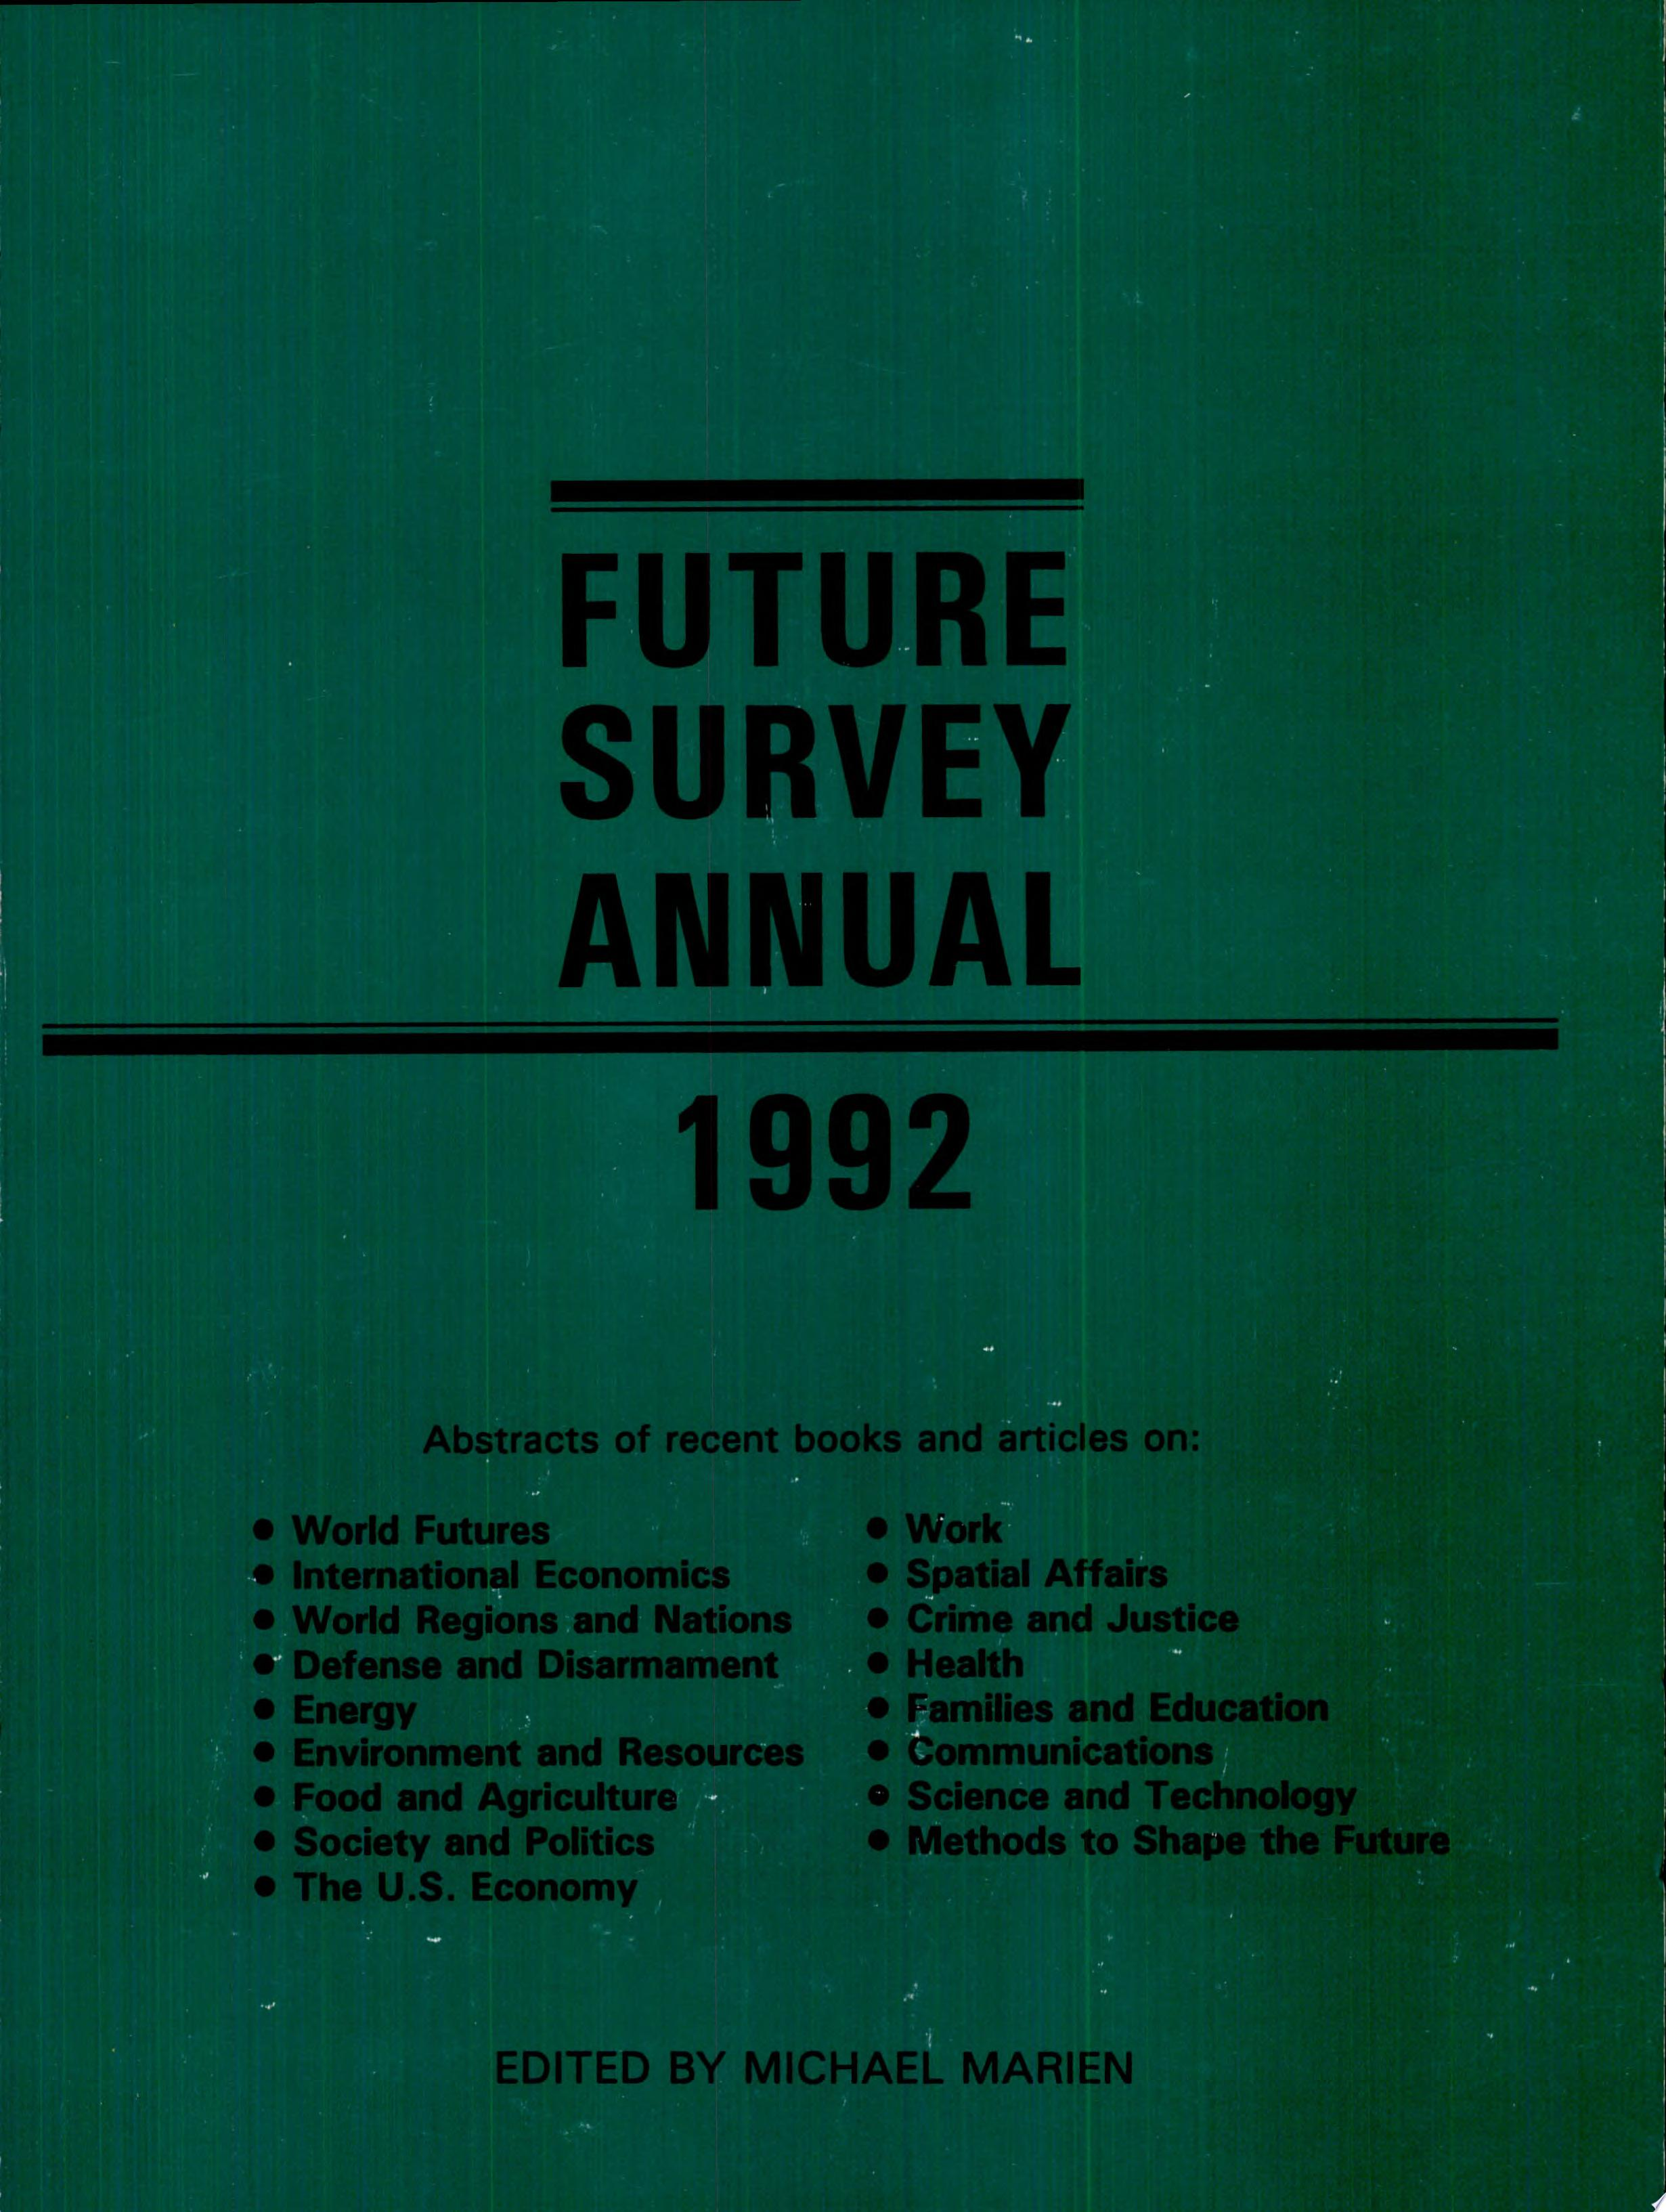 Future Survey Annual 1992